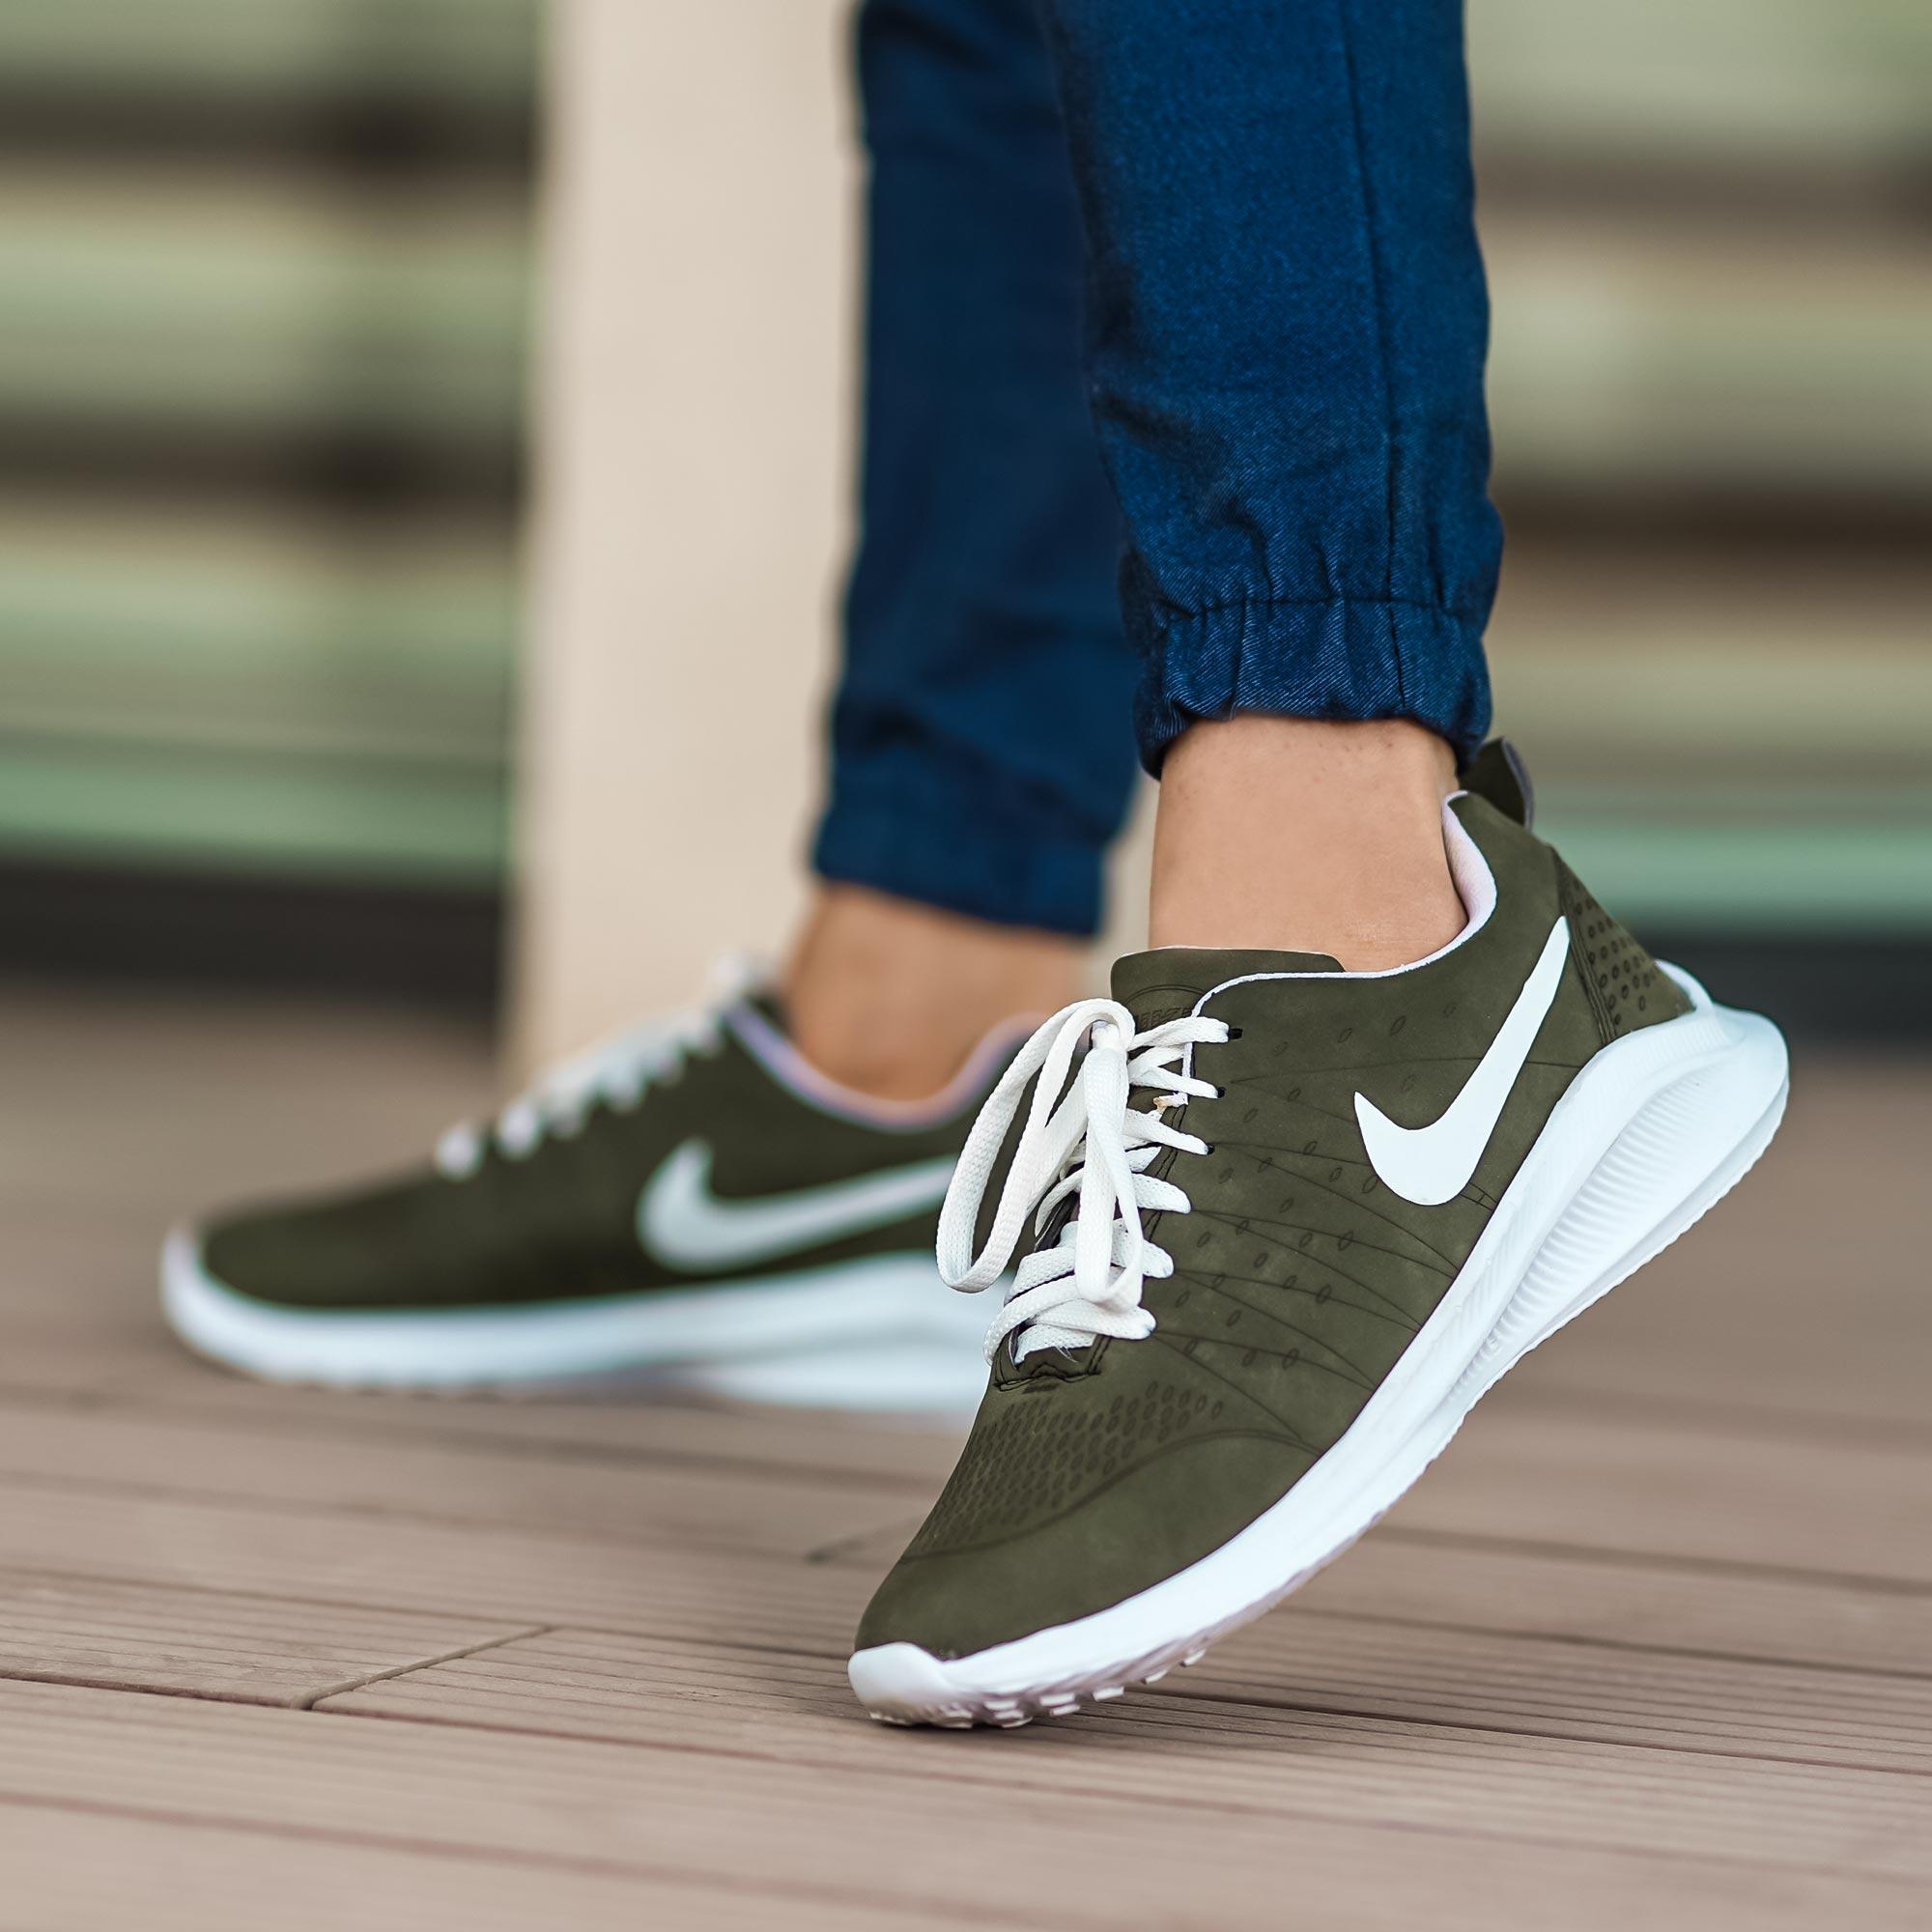 شش مدل کفش کتونی اسپرت طوسی قهوه ای مشکی آبی سبز لجنی